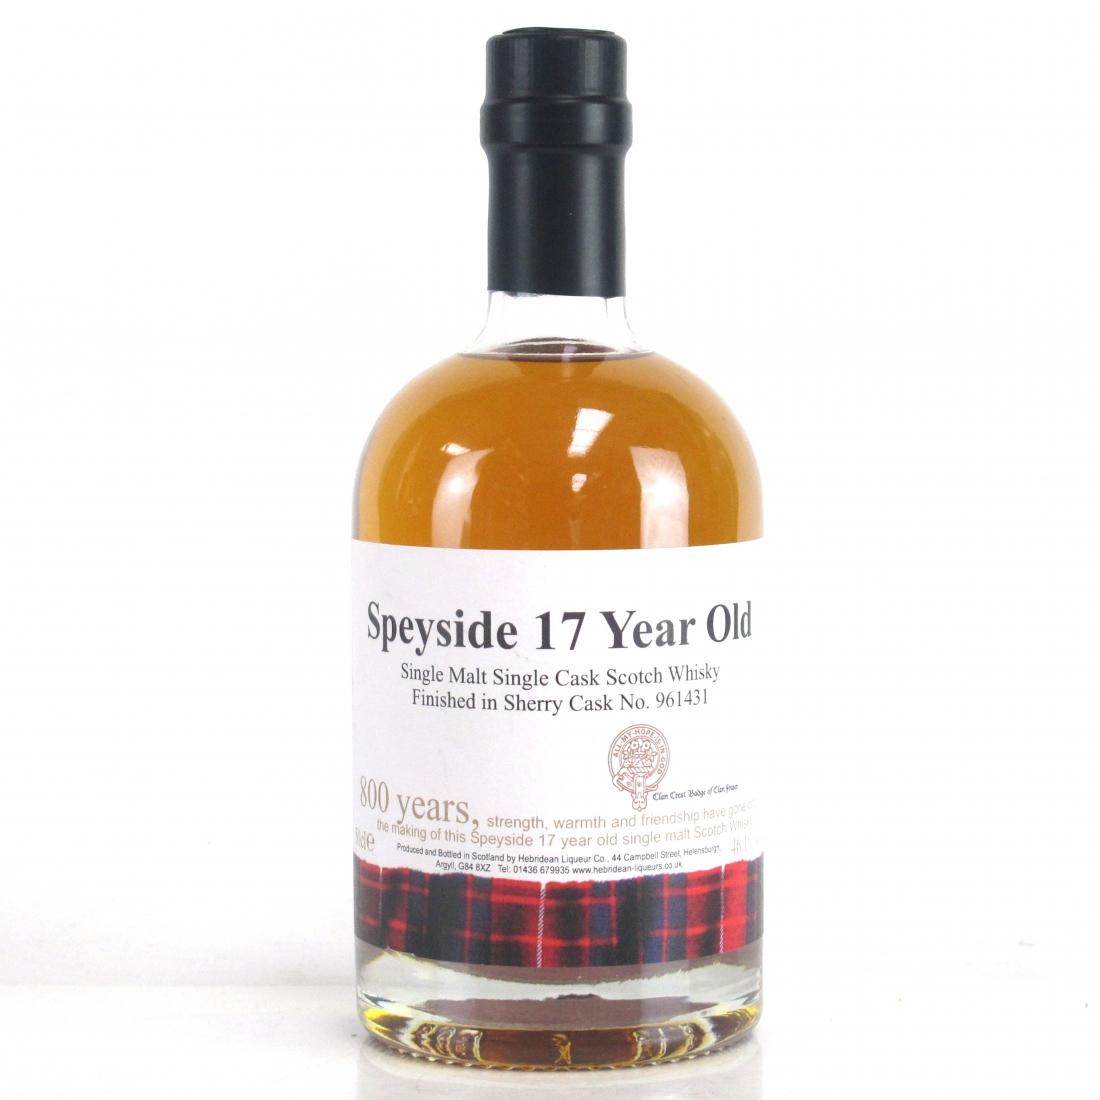 Speyside 17 Year Old Hebridean Liqueur Co. 50cl